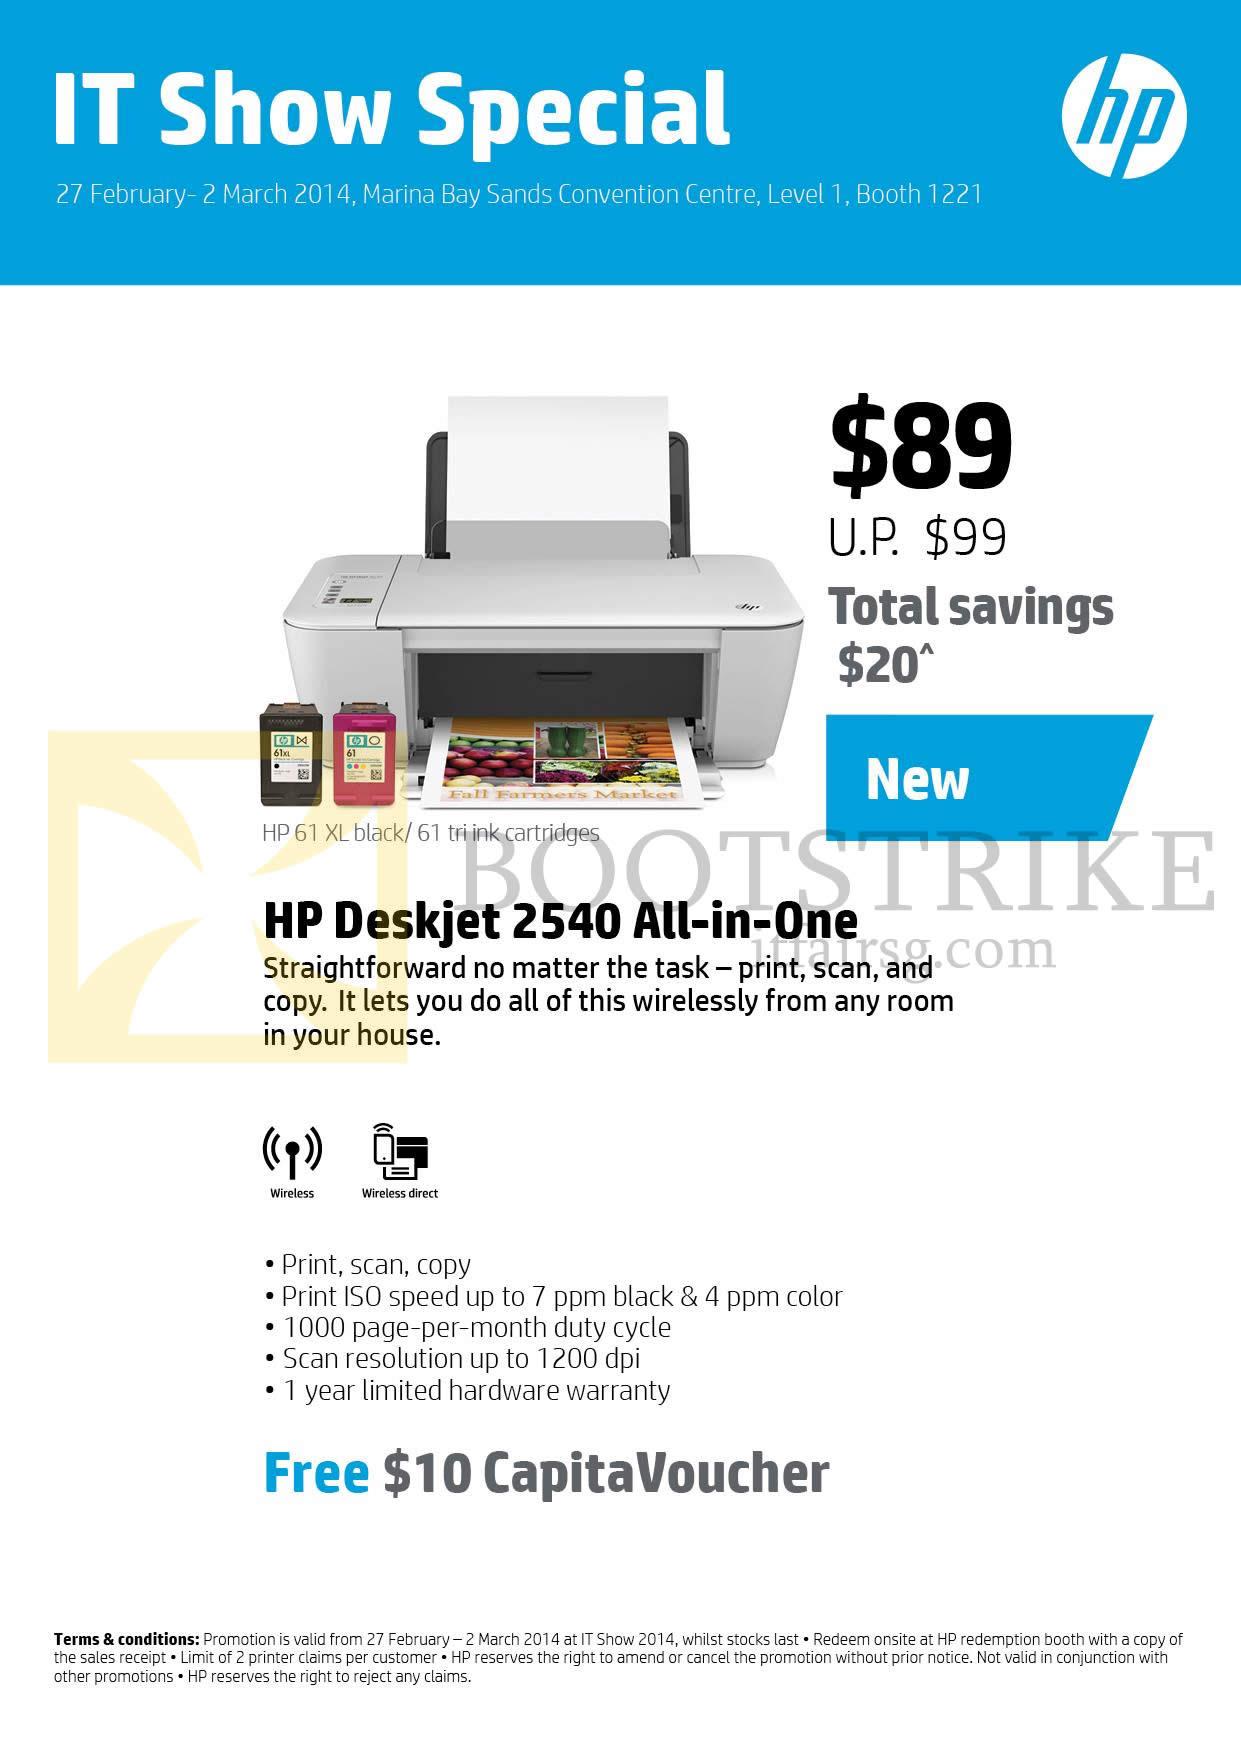 HP Printer Deskjet 2540 IT SHOW 2014 Price List Brochure Flyer Image